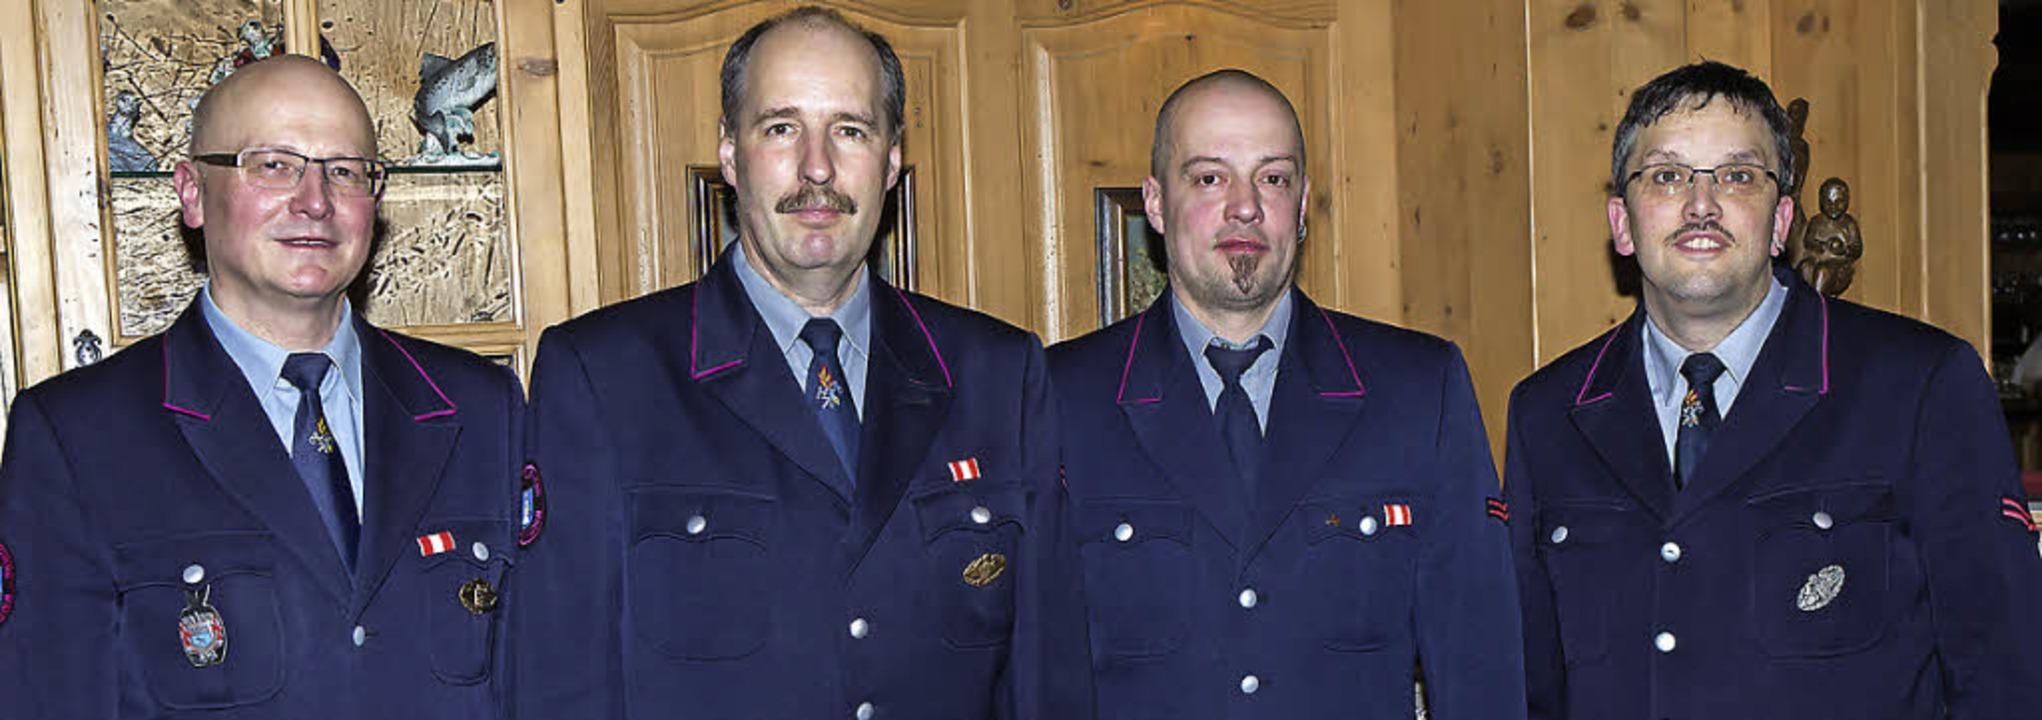 Gesamtwehrkommandant Guido Strittmatte... Rolf Schlatter und Christian Gantert.    Foto: Chris Seifried